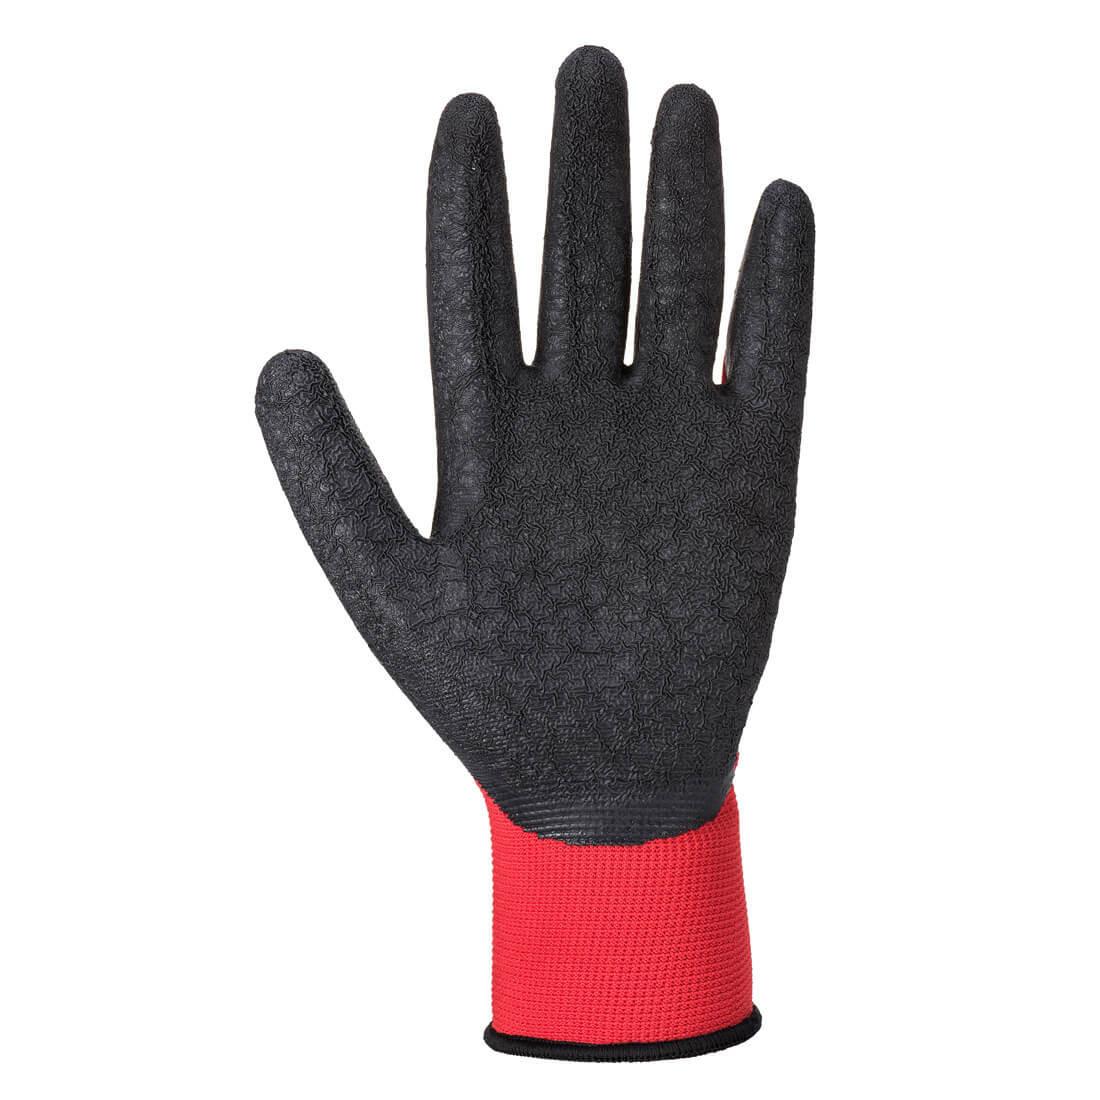 Manusi Latex Flex Grip - Echipamente de protectie personala